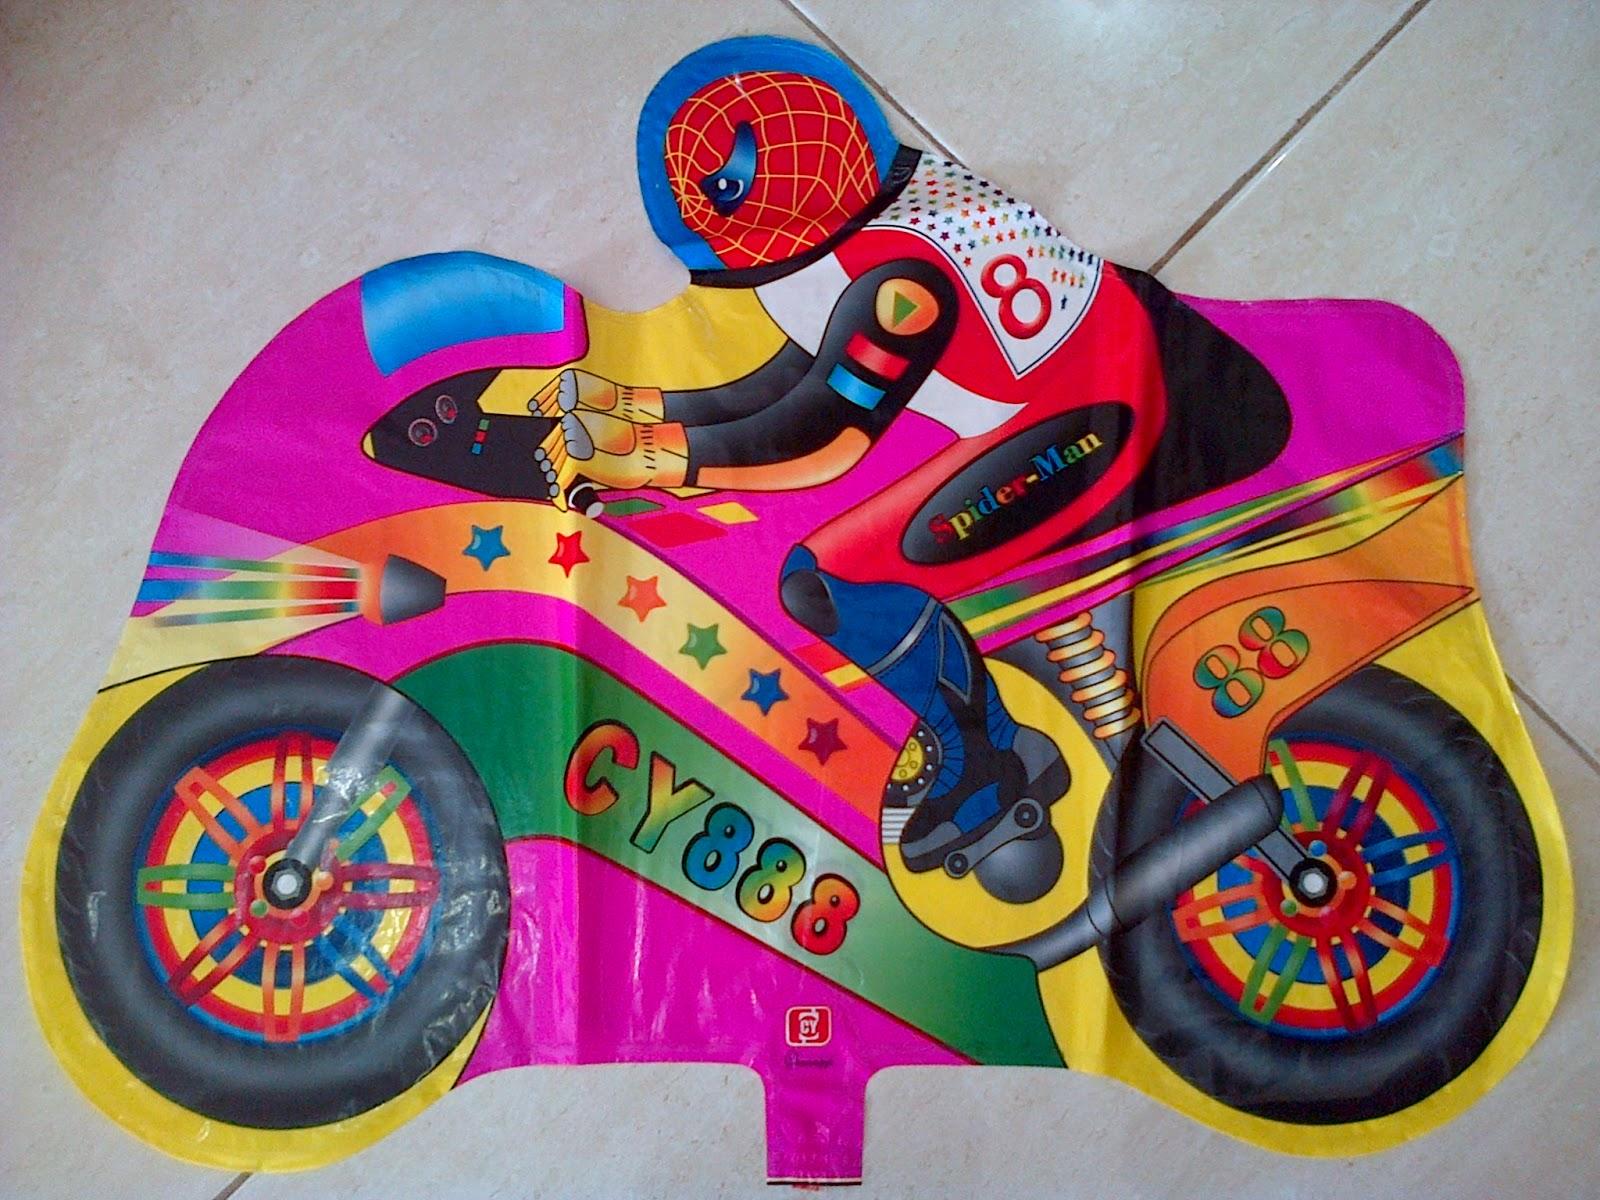 Balon Character Motor Spiderman Pink Anugerah Utama Toys Motif Ultraman